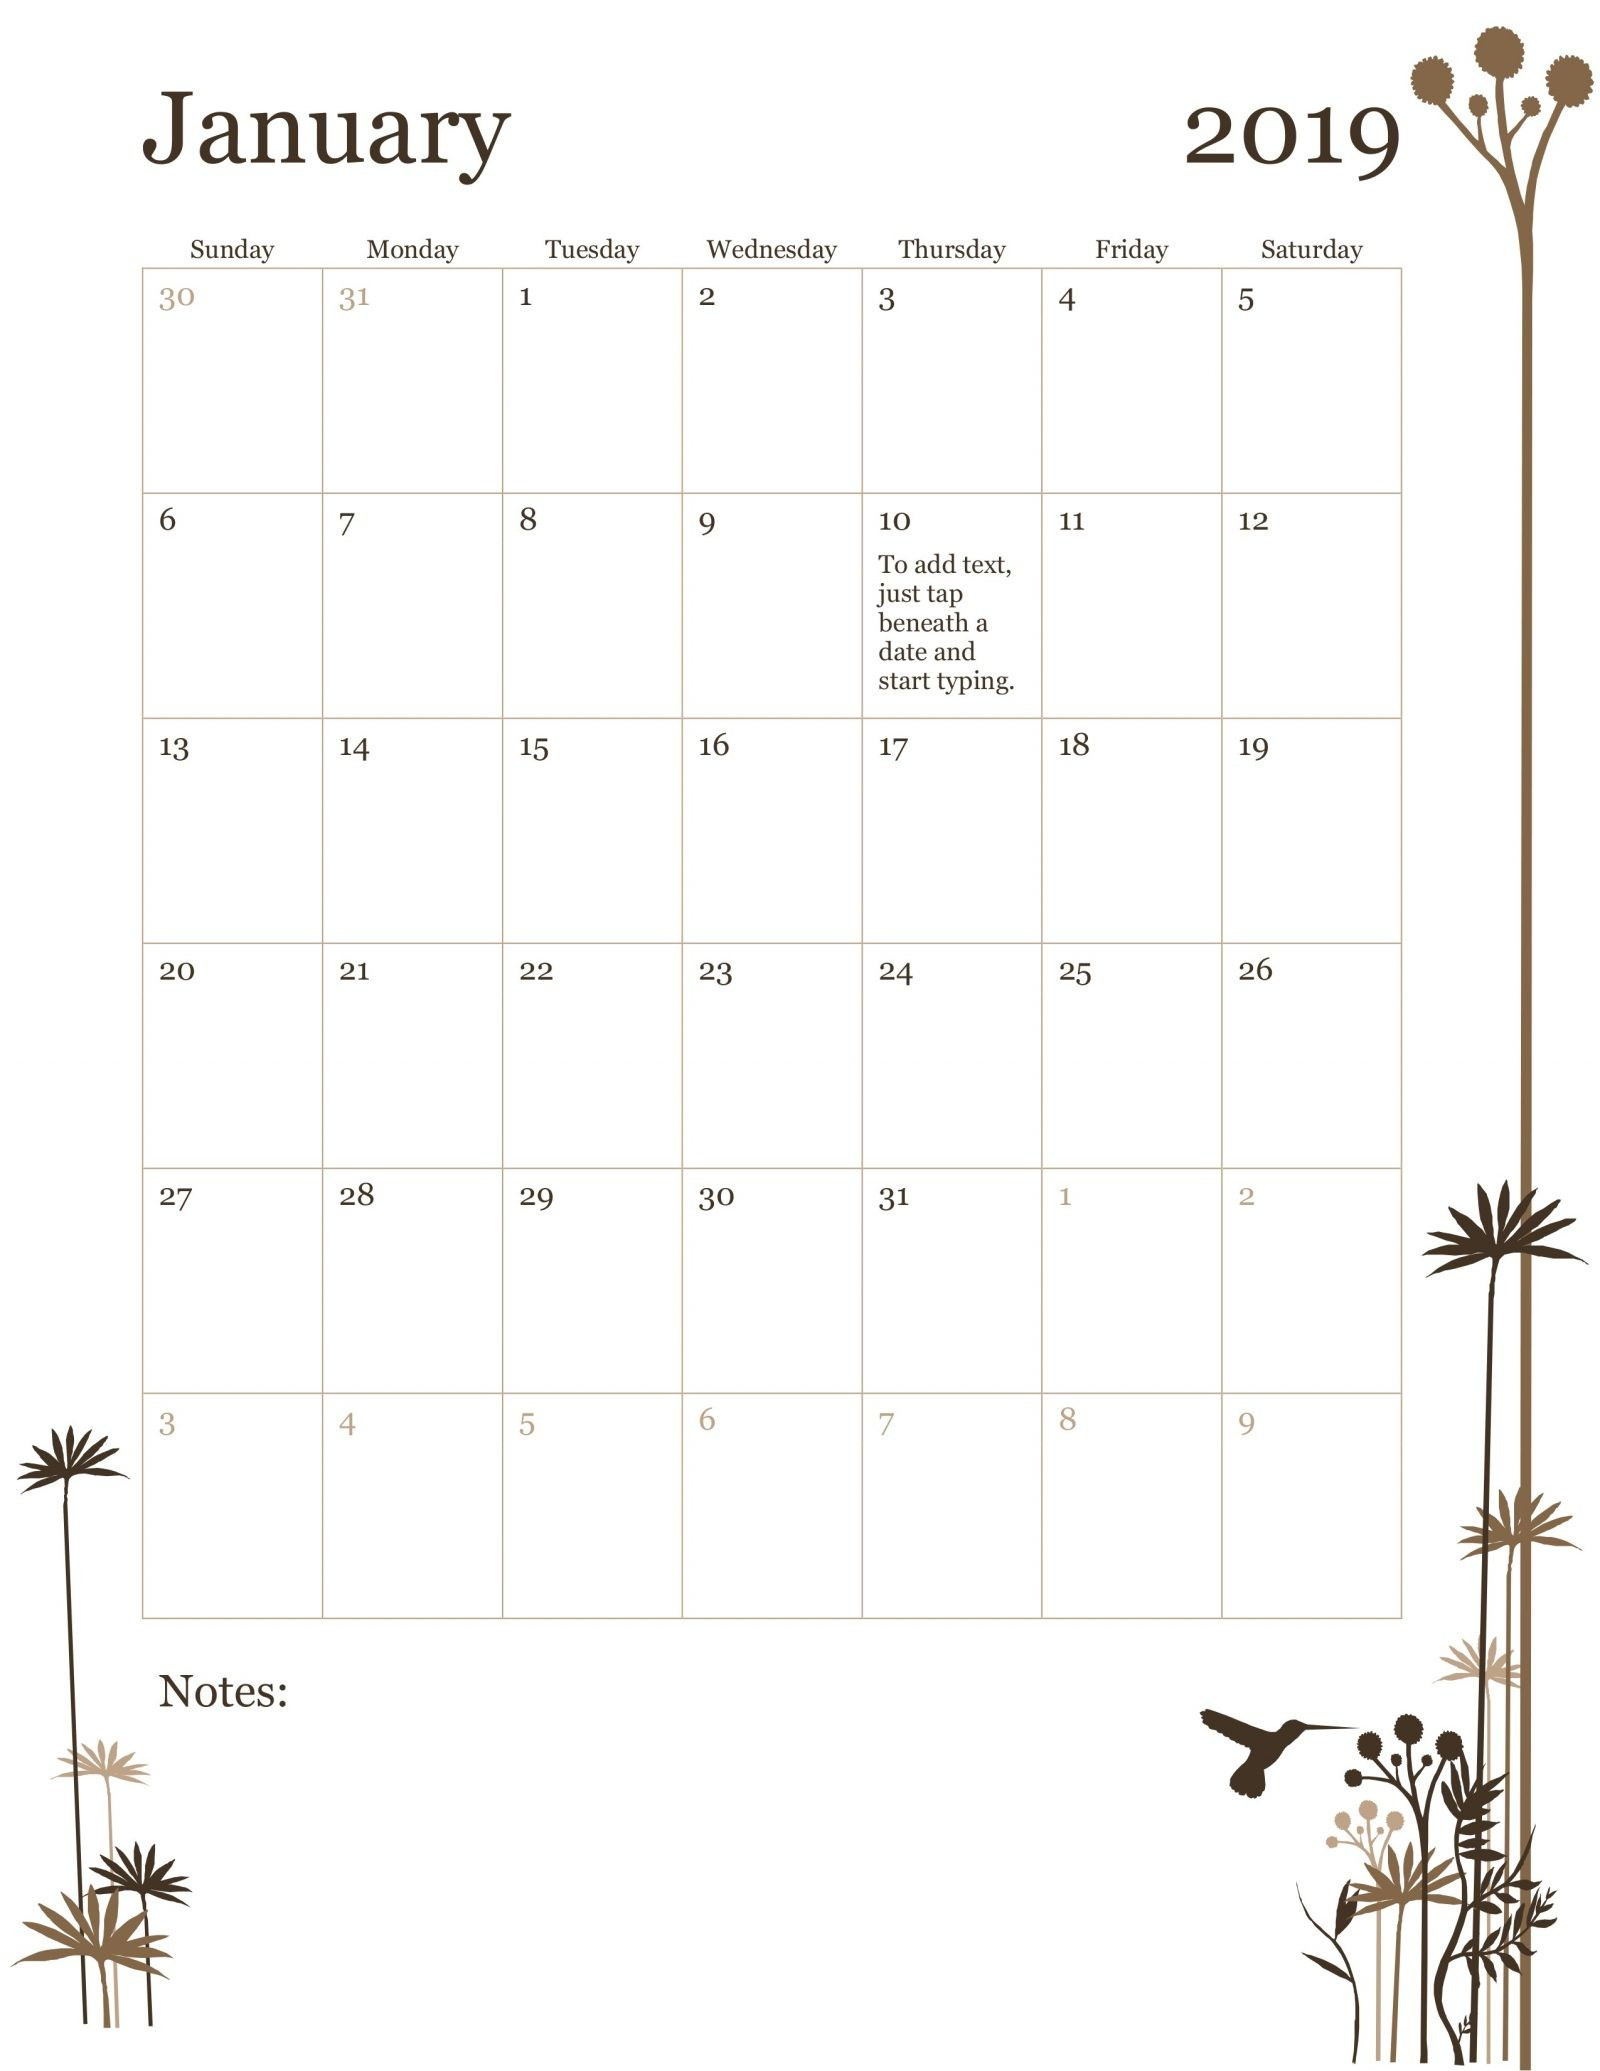 Calendario 2020 Jan Más Reciente Free Excel Calendar Templates Monthly Template Ic 2020 S Of Calendario 2020 Jan Más Populares Free Excel Calendar Templates Monthly Template Ic 2020 S